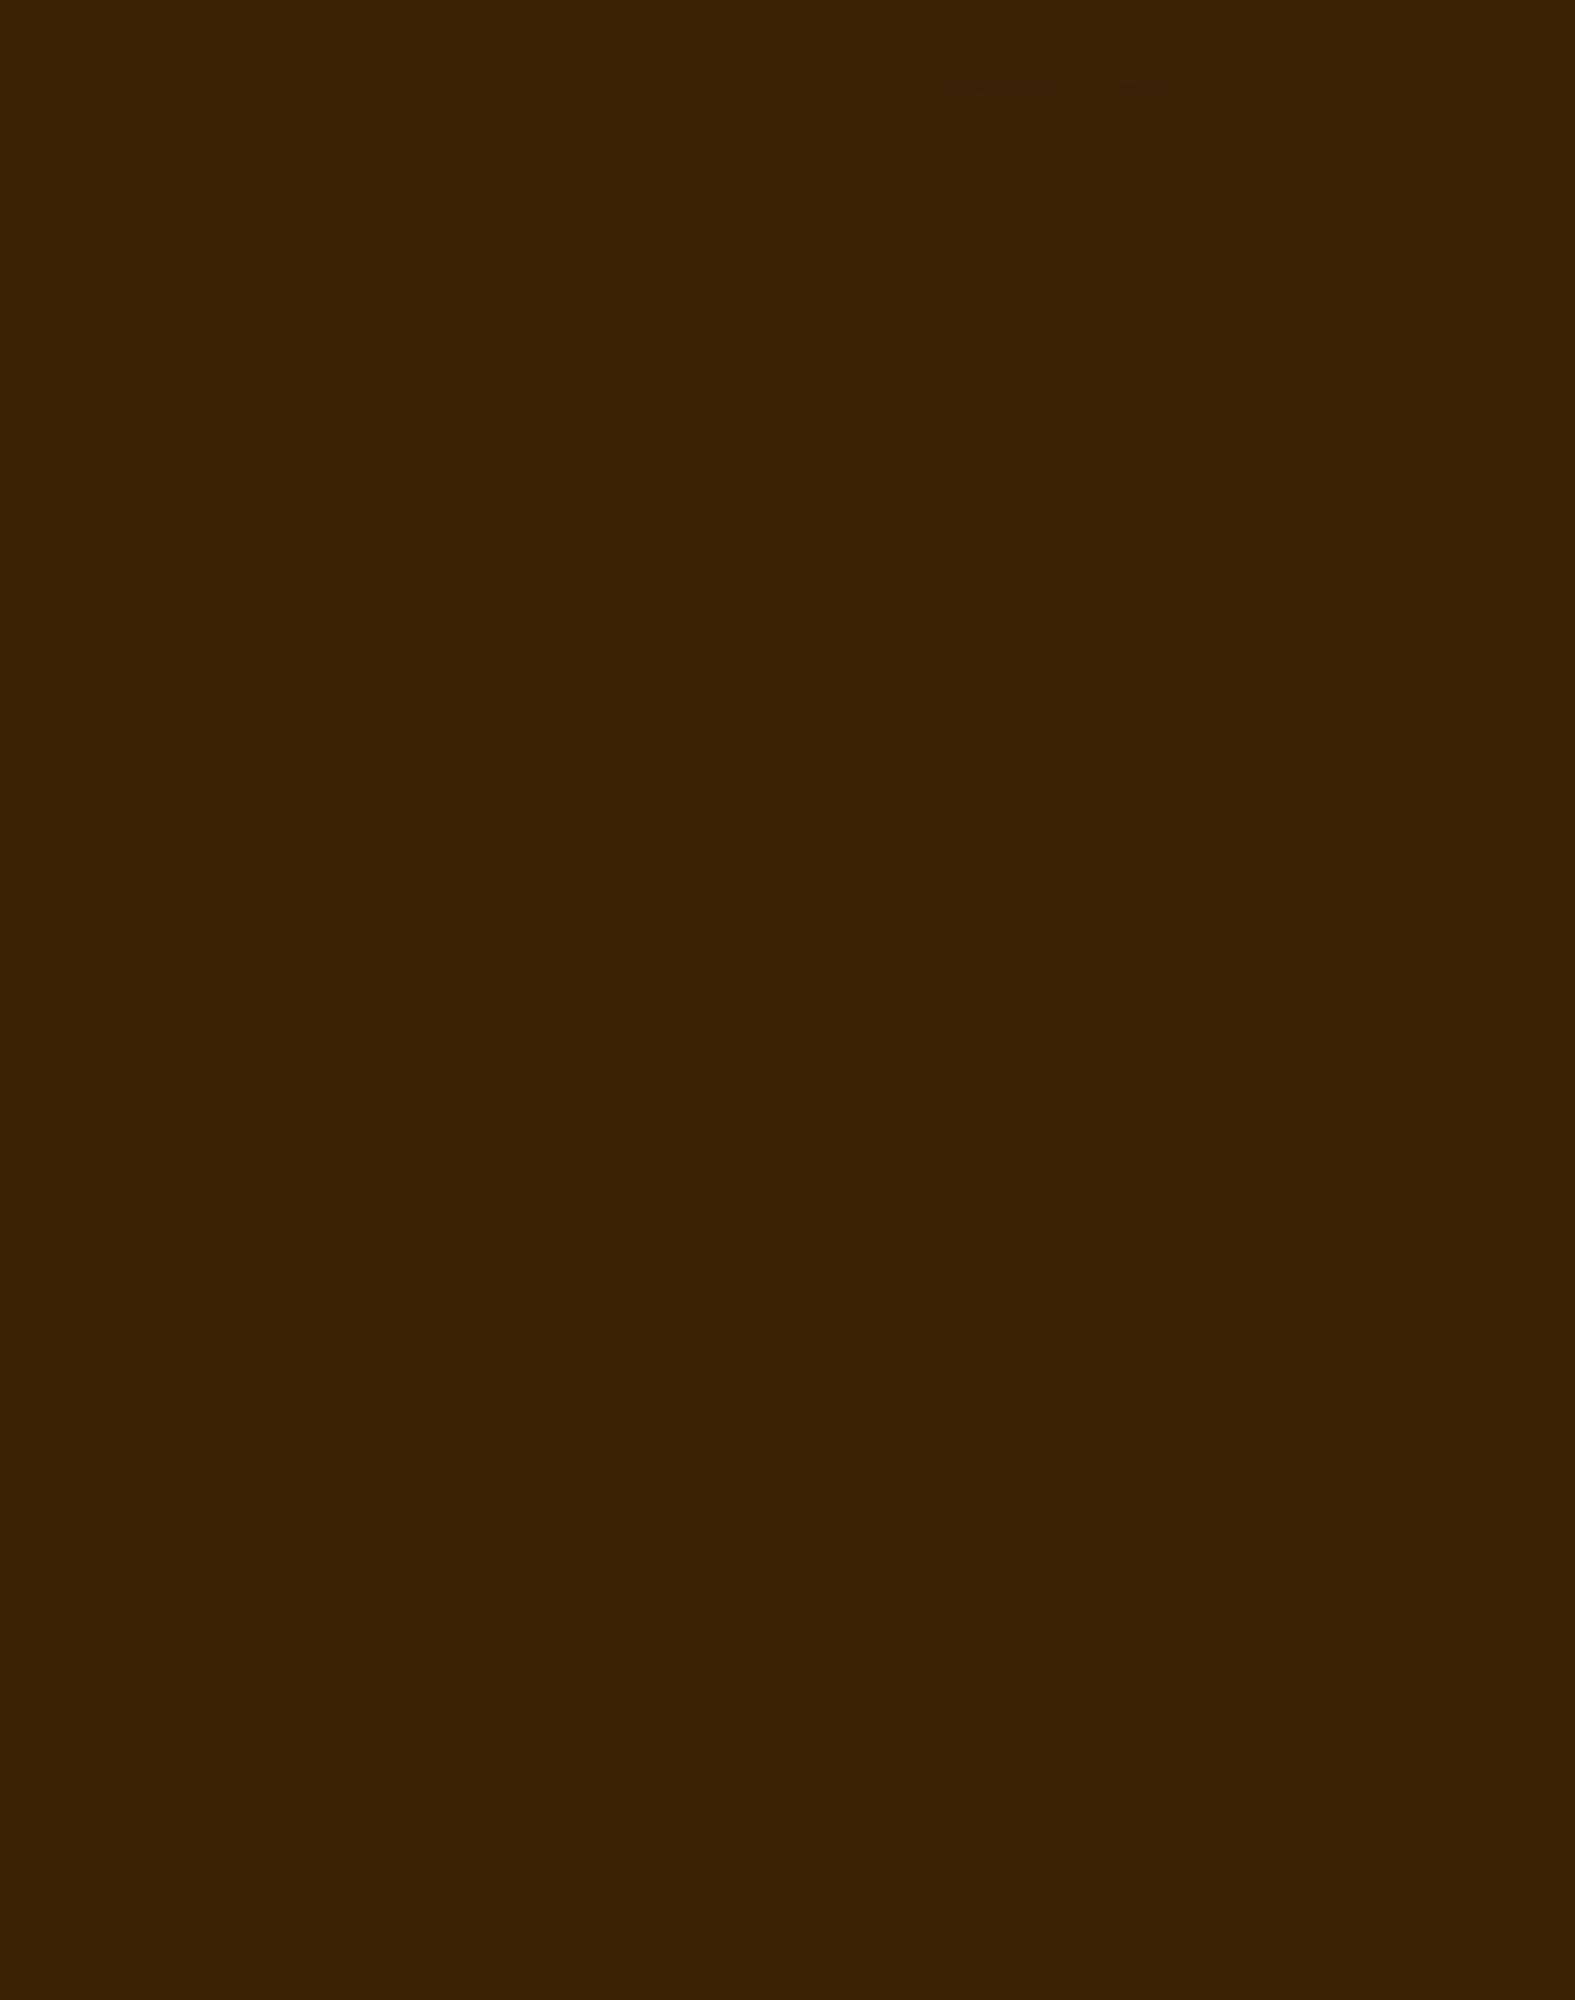 (Woodcare) Dark Rosewood 58,36,6